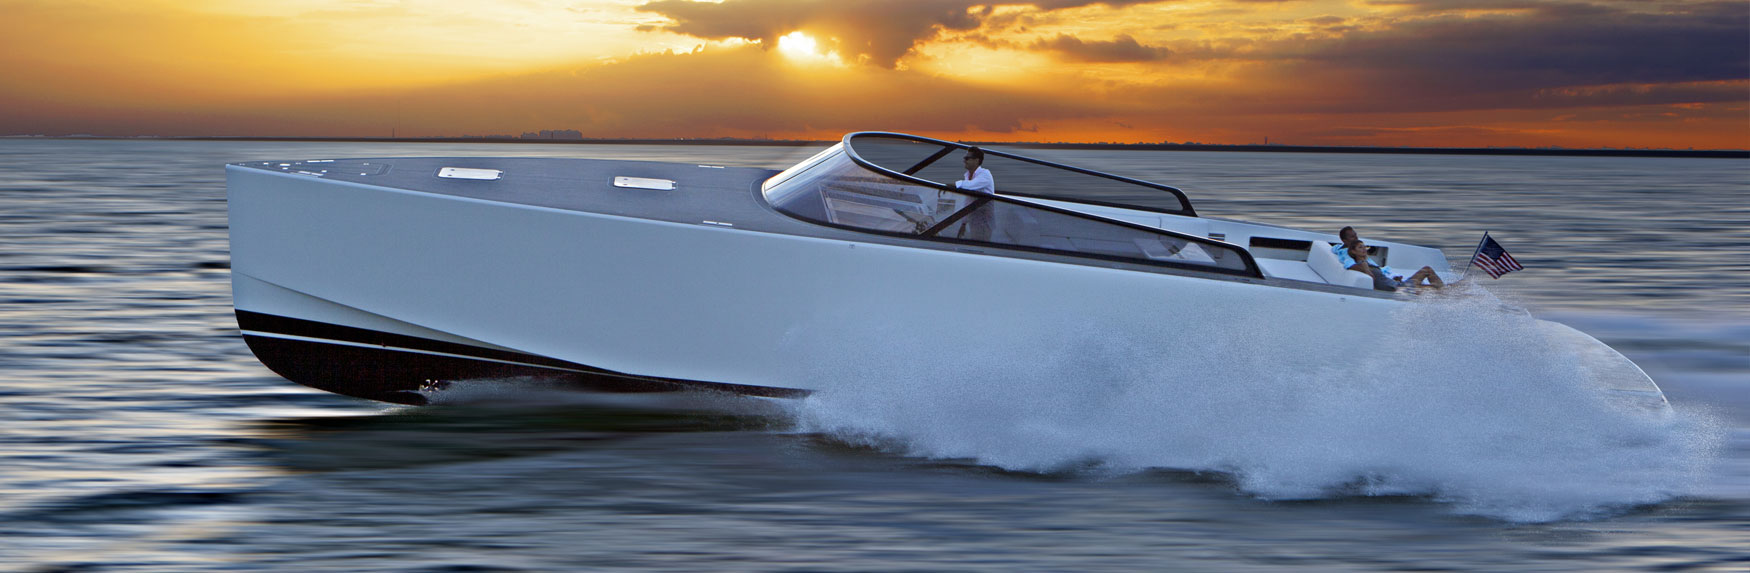 The Brand Van Dutch Luxury Yachting